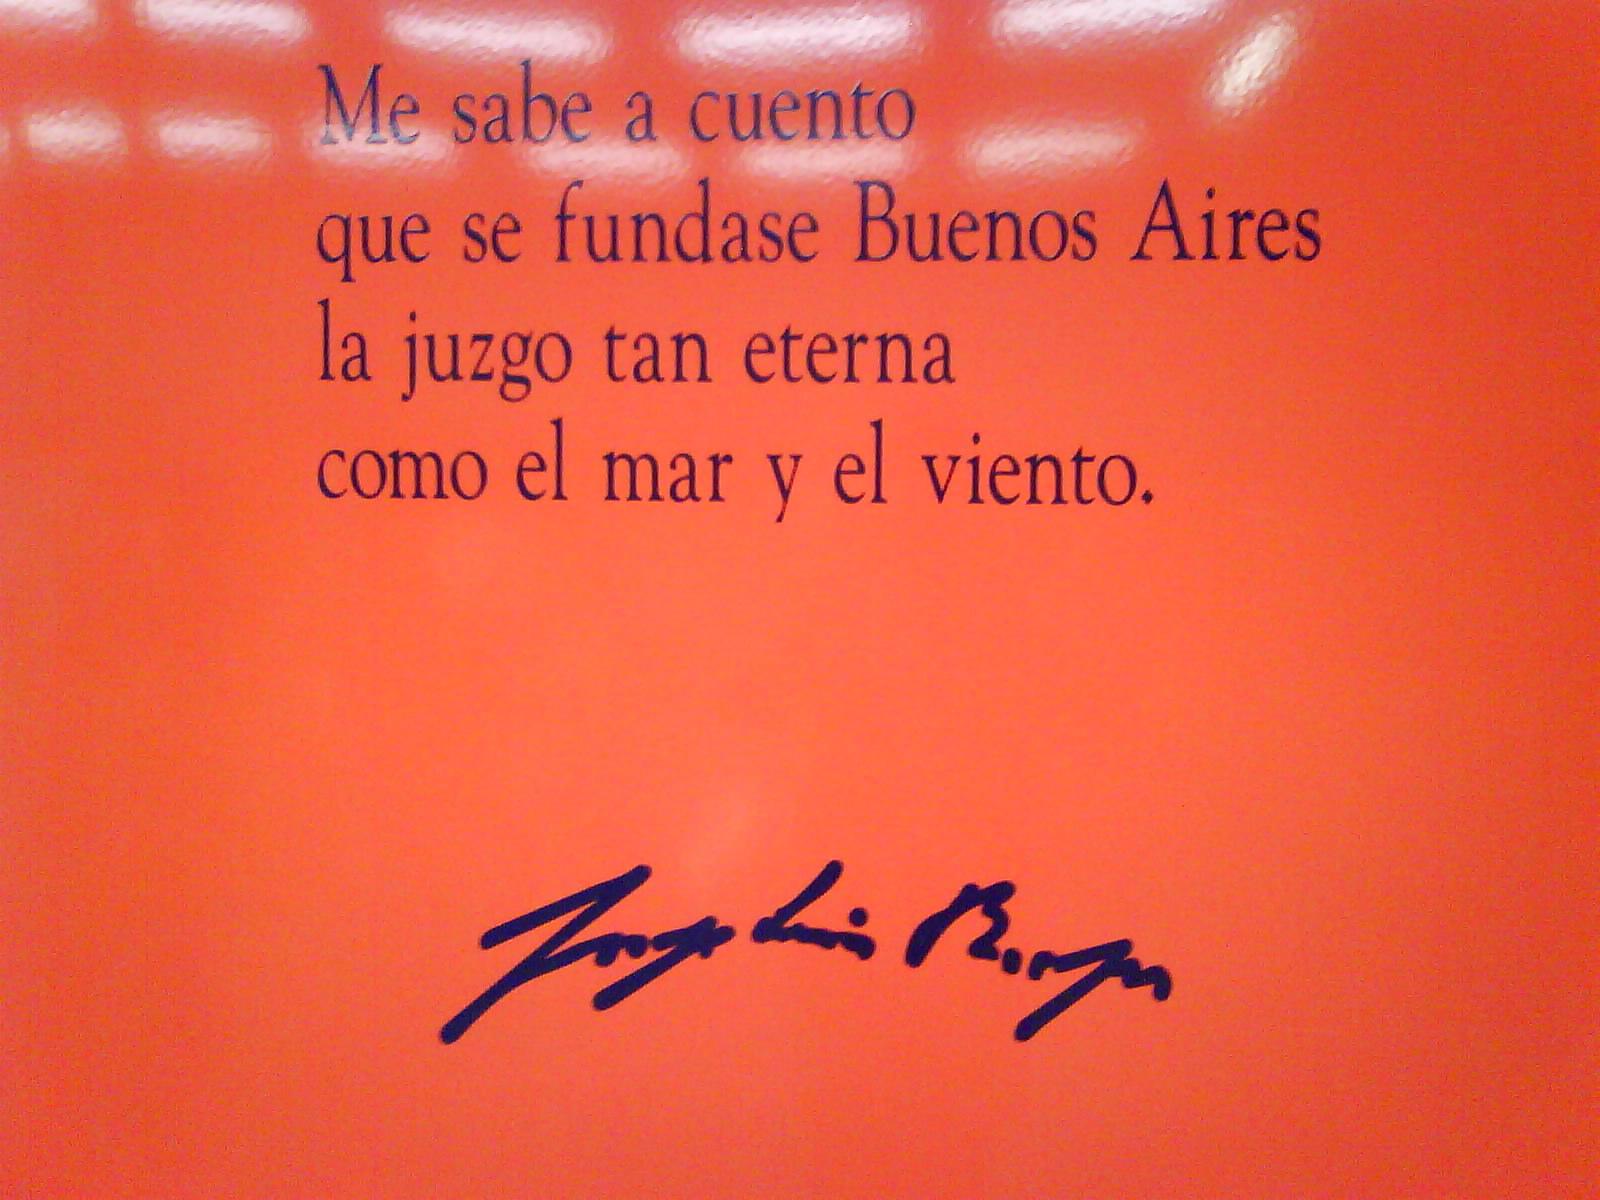 Jorge Luis Borges's quote #7